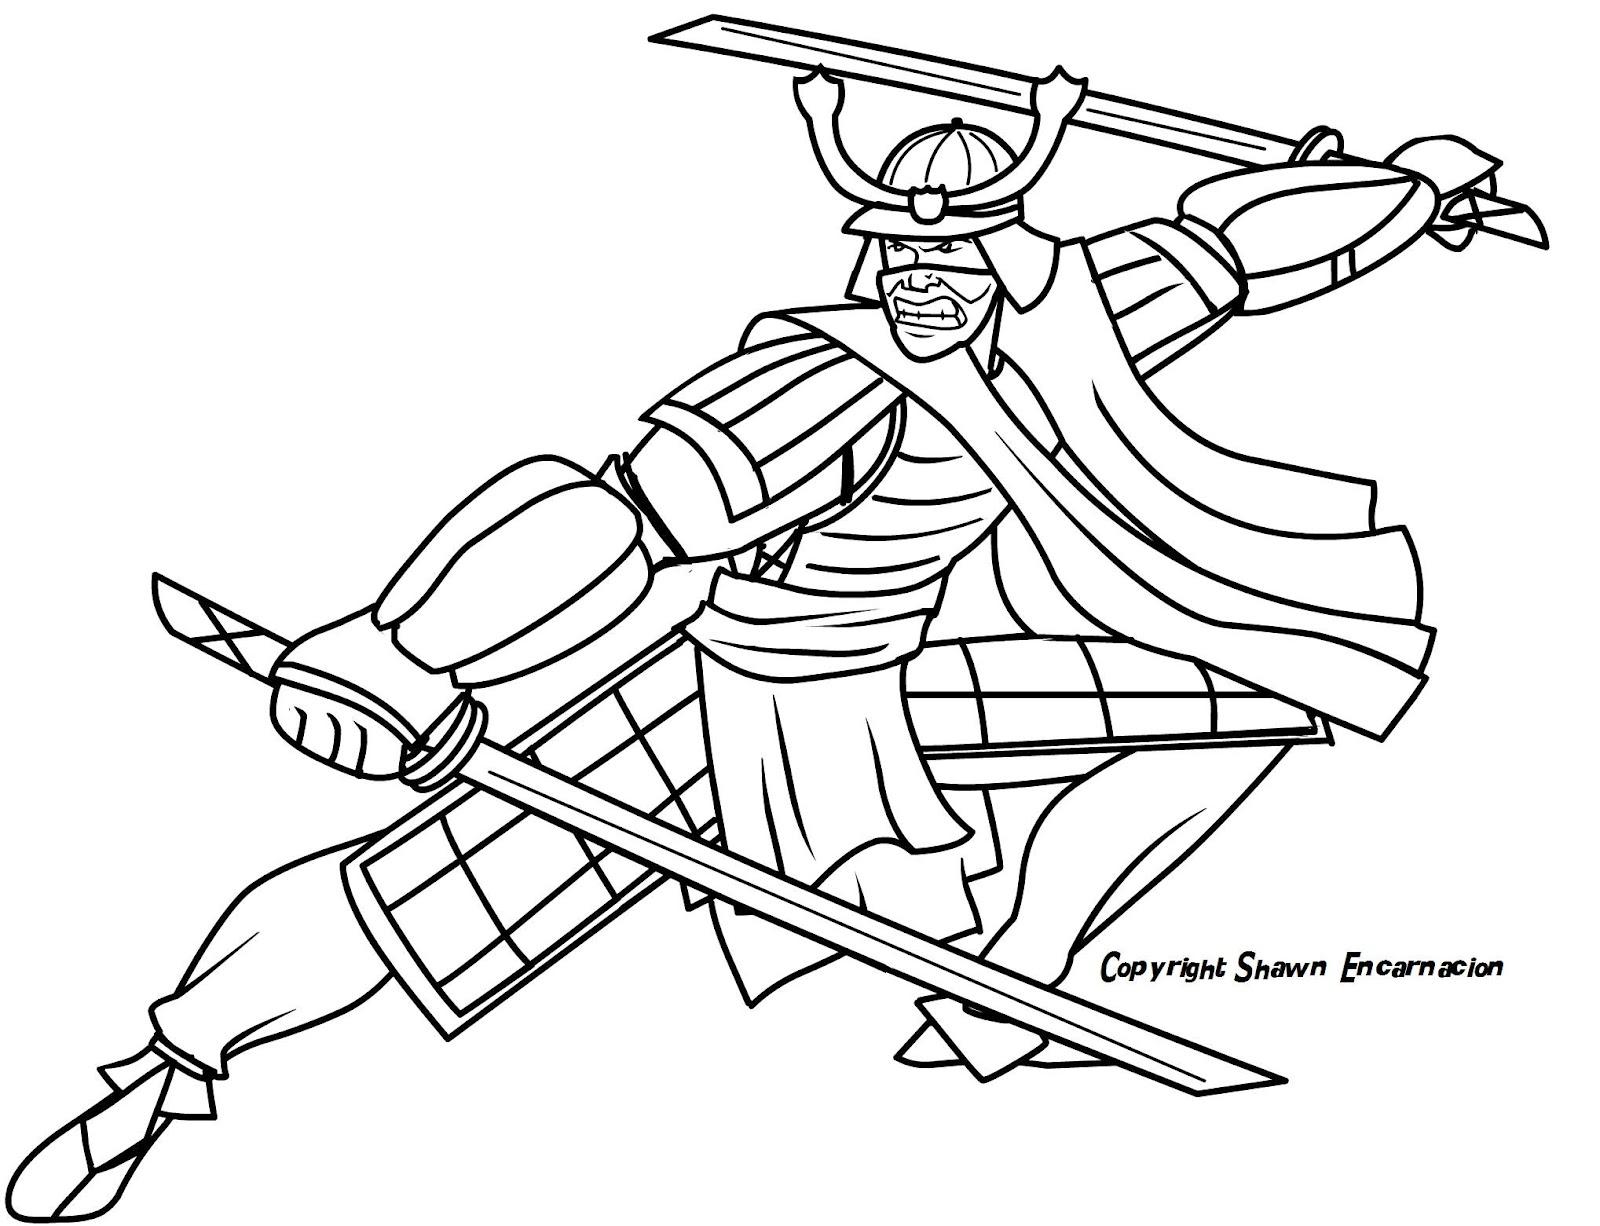 Samurai Helmet Template - Costumepartyrun